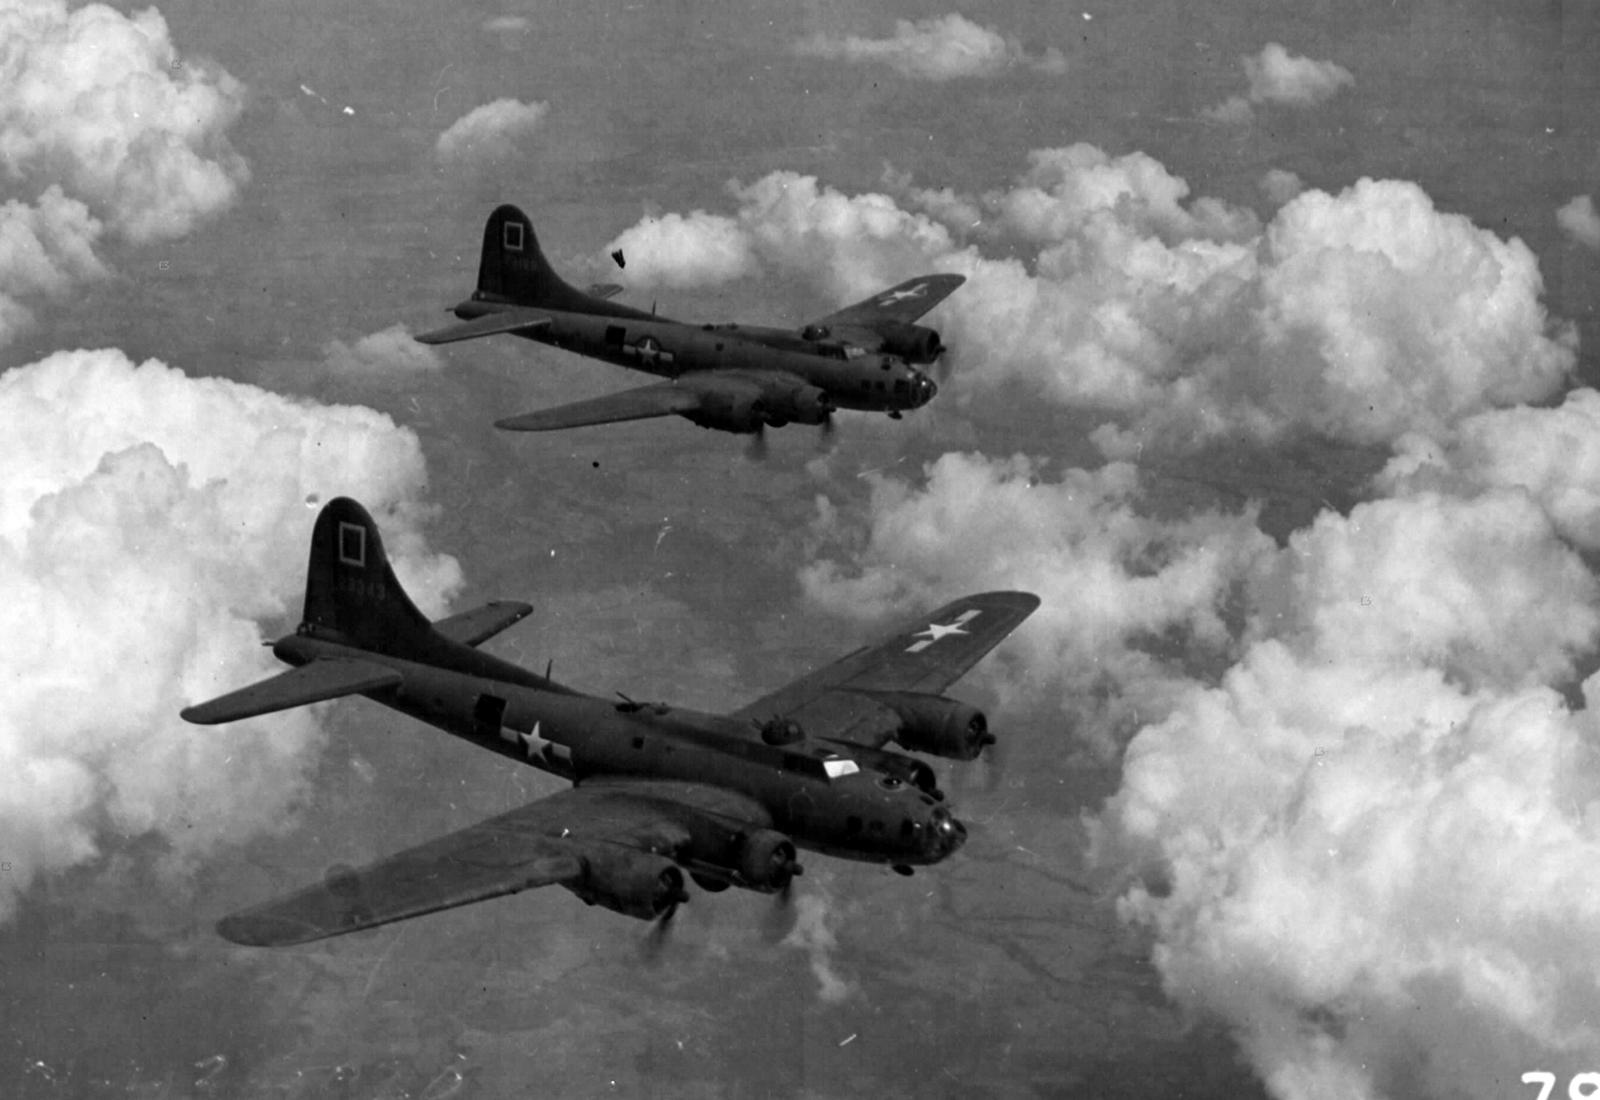 B-17 #42-3343 / Slick Chick